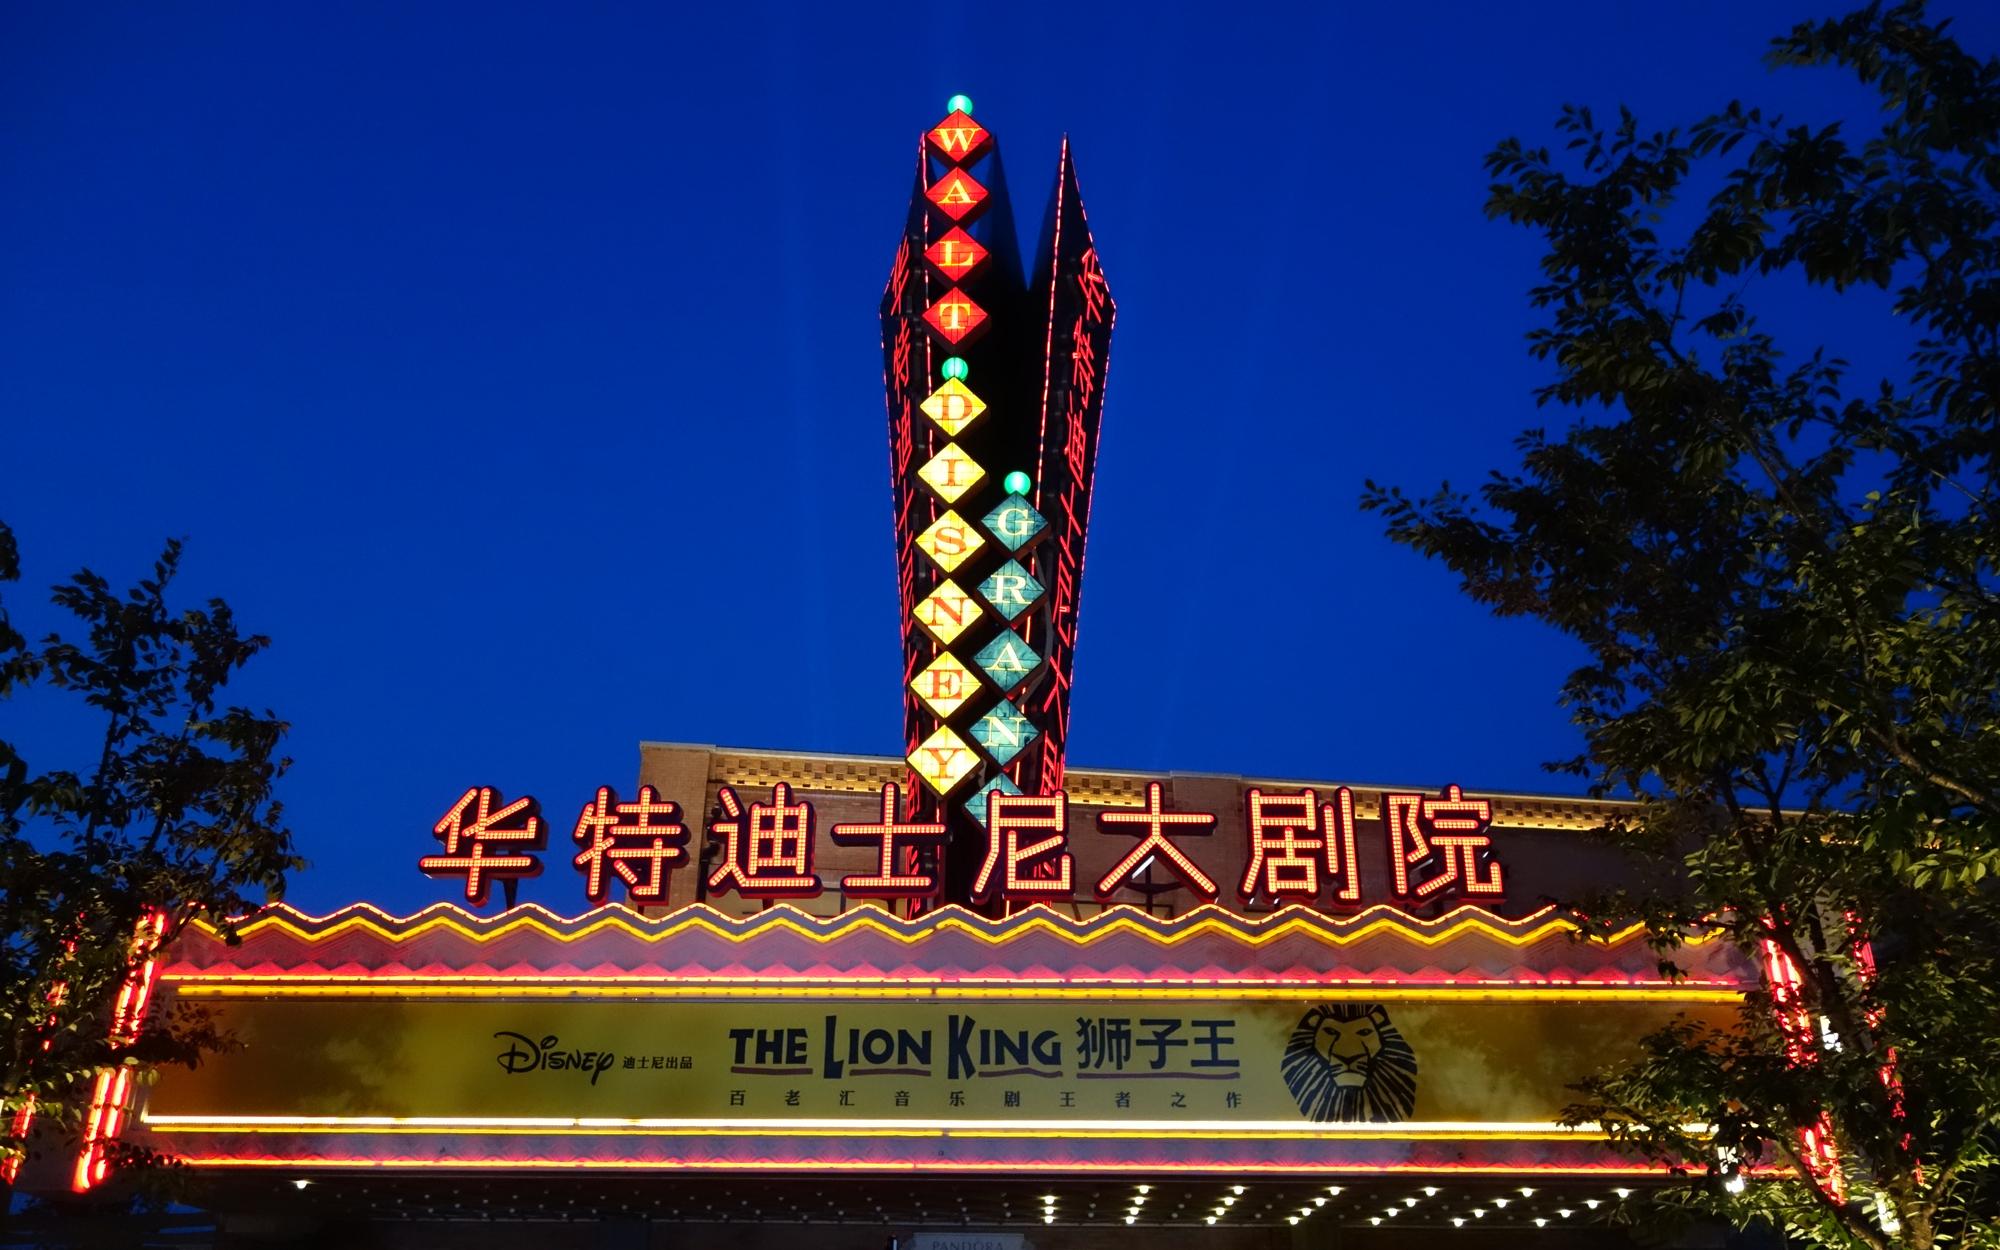 Shanghai-Disney-Scenes-13-EXCLUSIVE0616